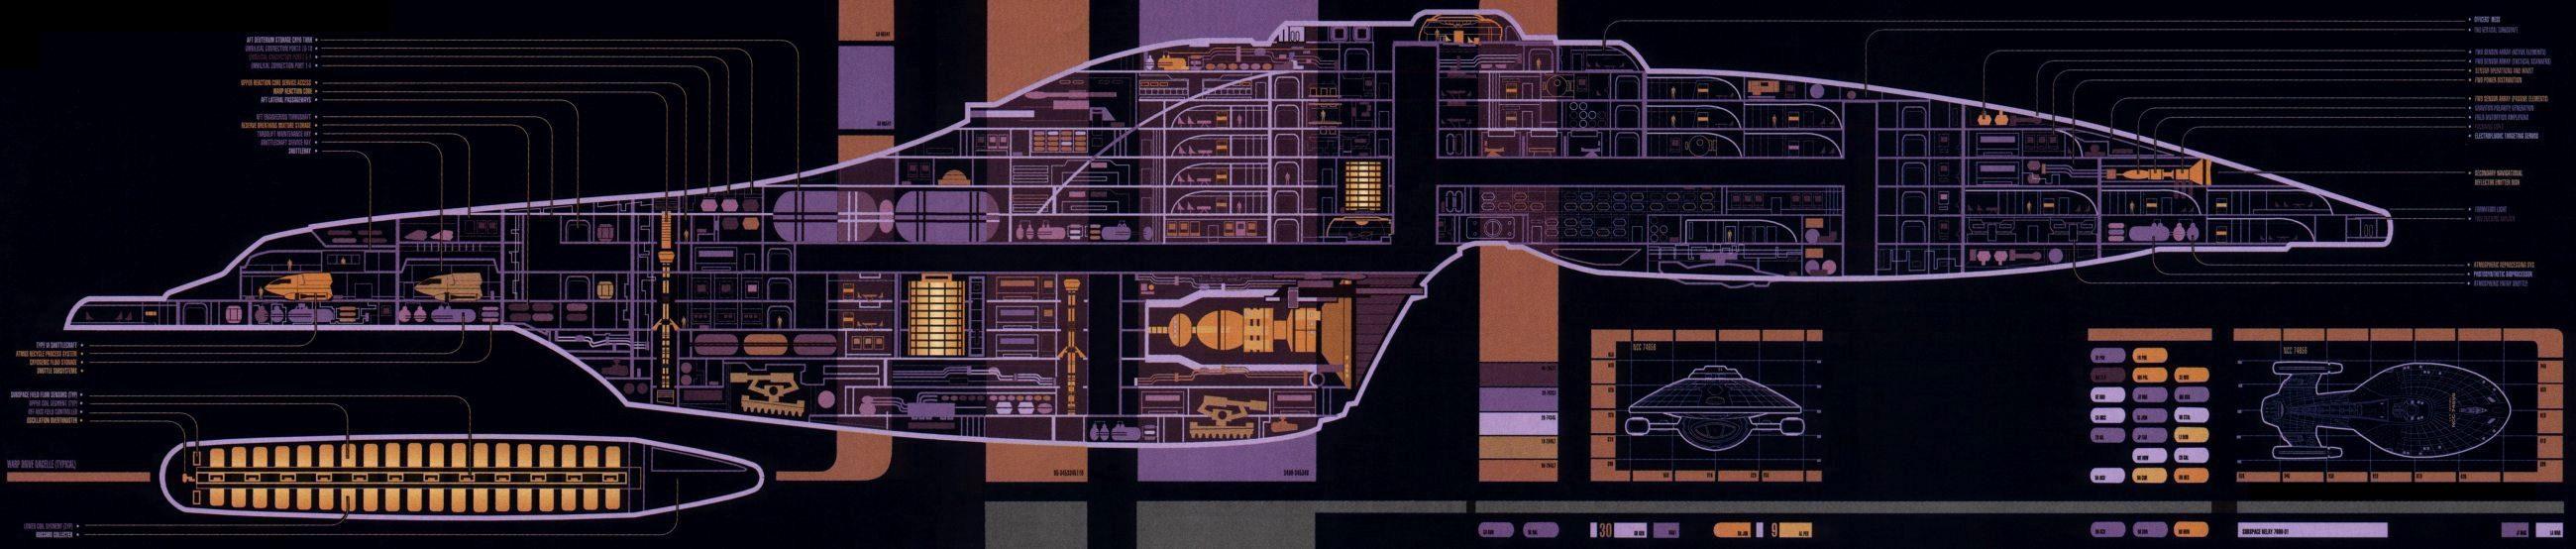 [TBQL_4184]  Intrepid class decks | Memory Alpha | Fandom | Voyager Schematics |  | Memory Alpha - Fandom